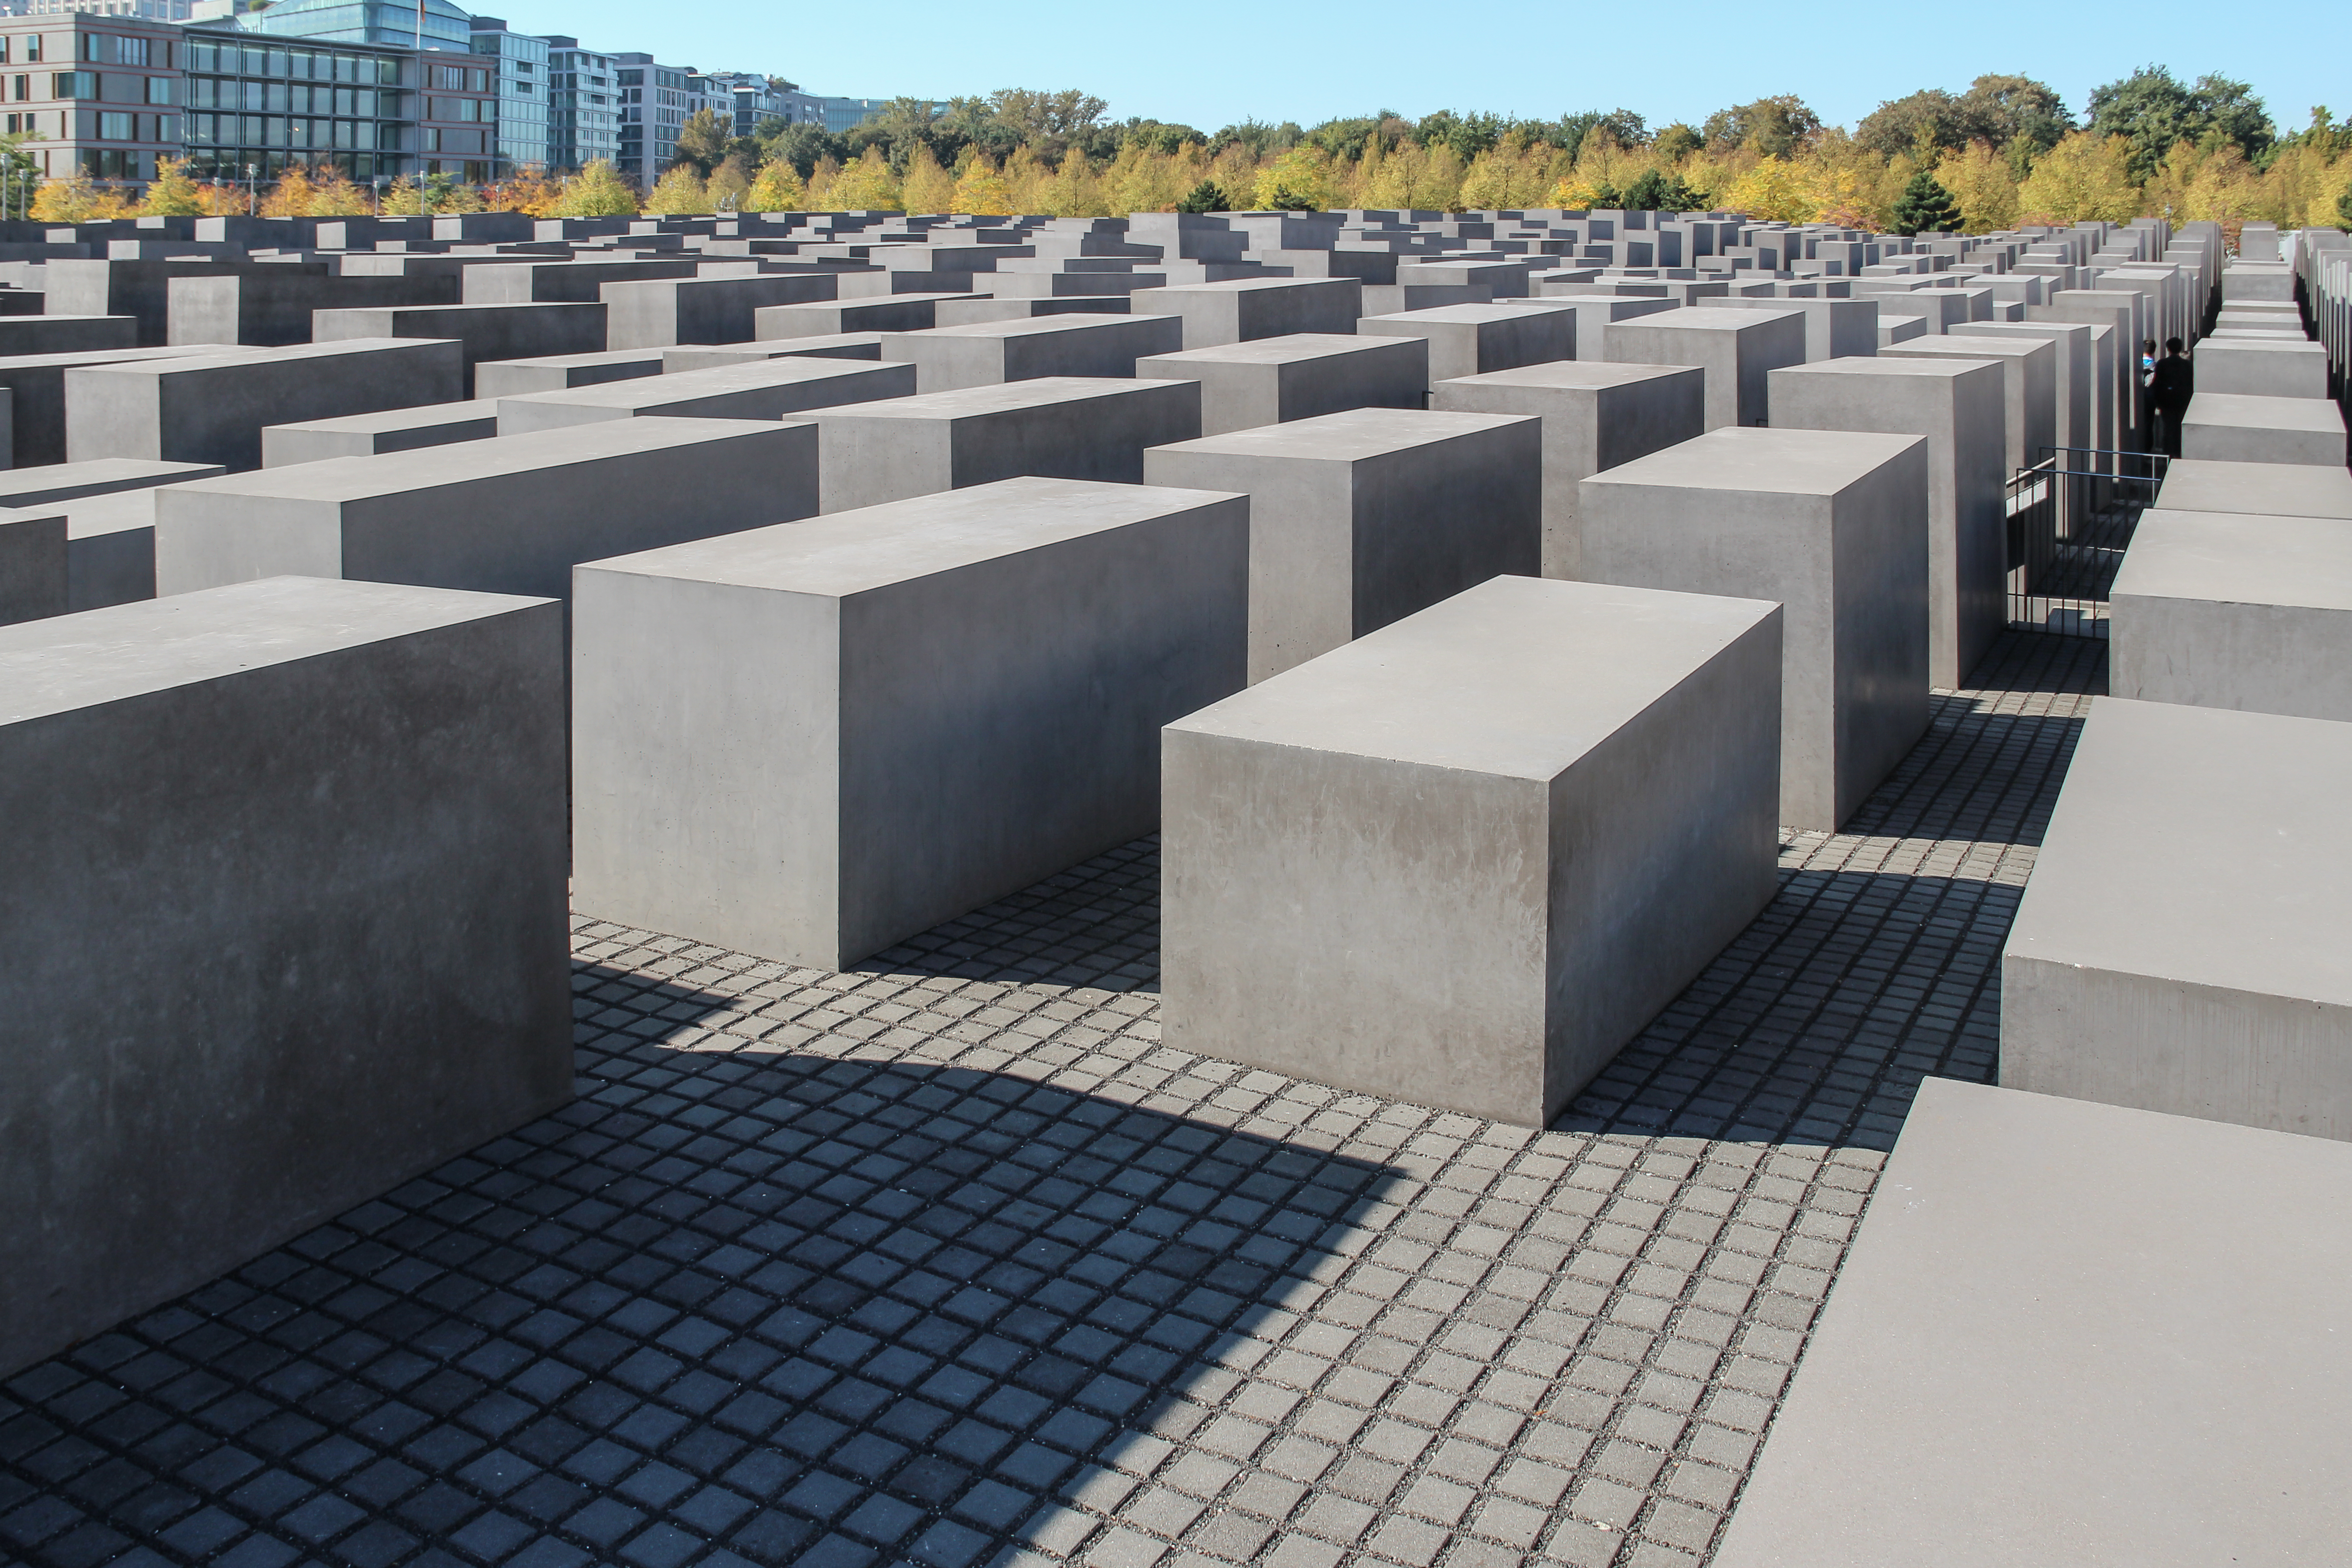 file berlin denkmal f r die ermordeten juden europas. Black Bedroom Furniture Sets. Home Design Ideas